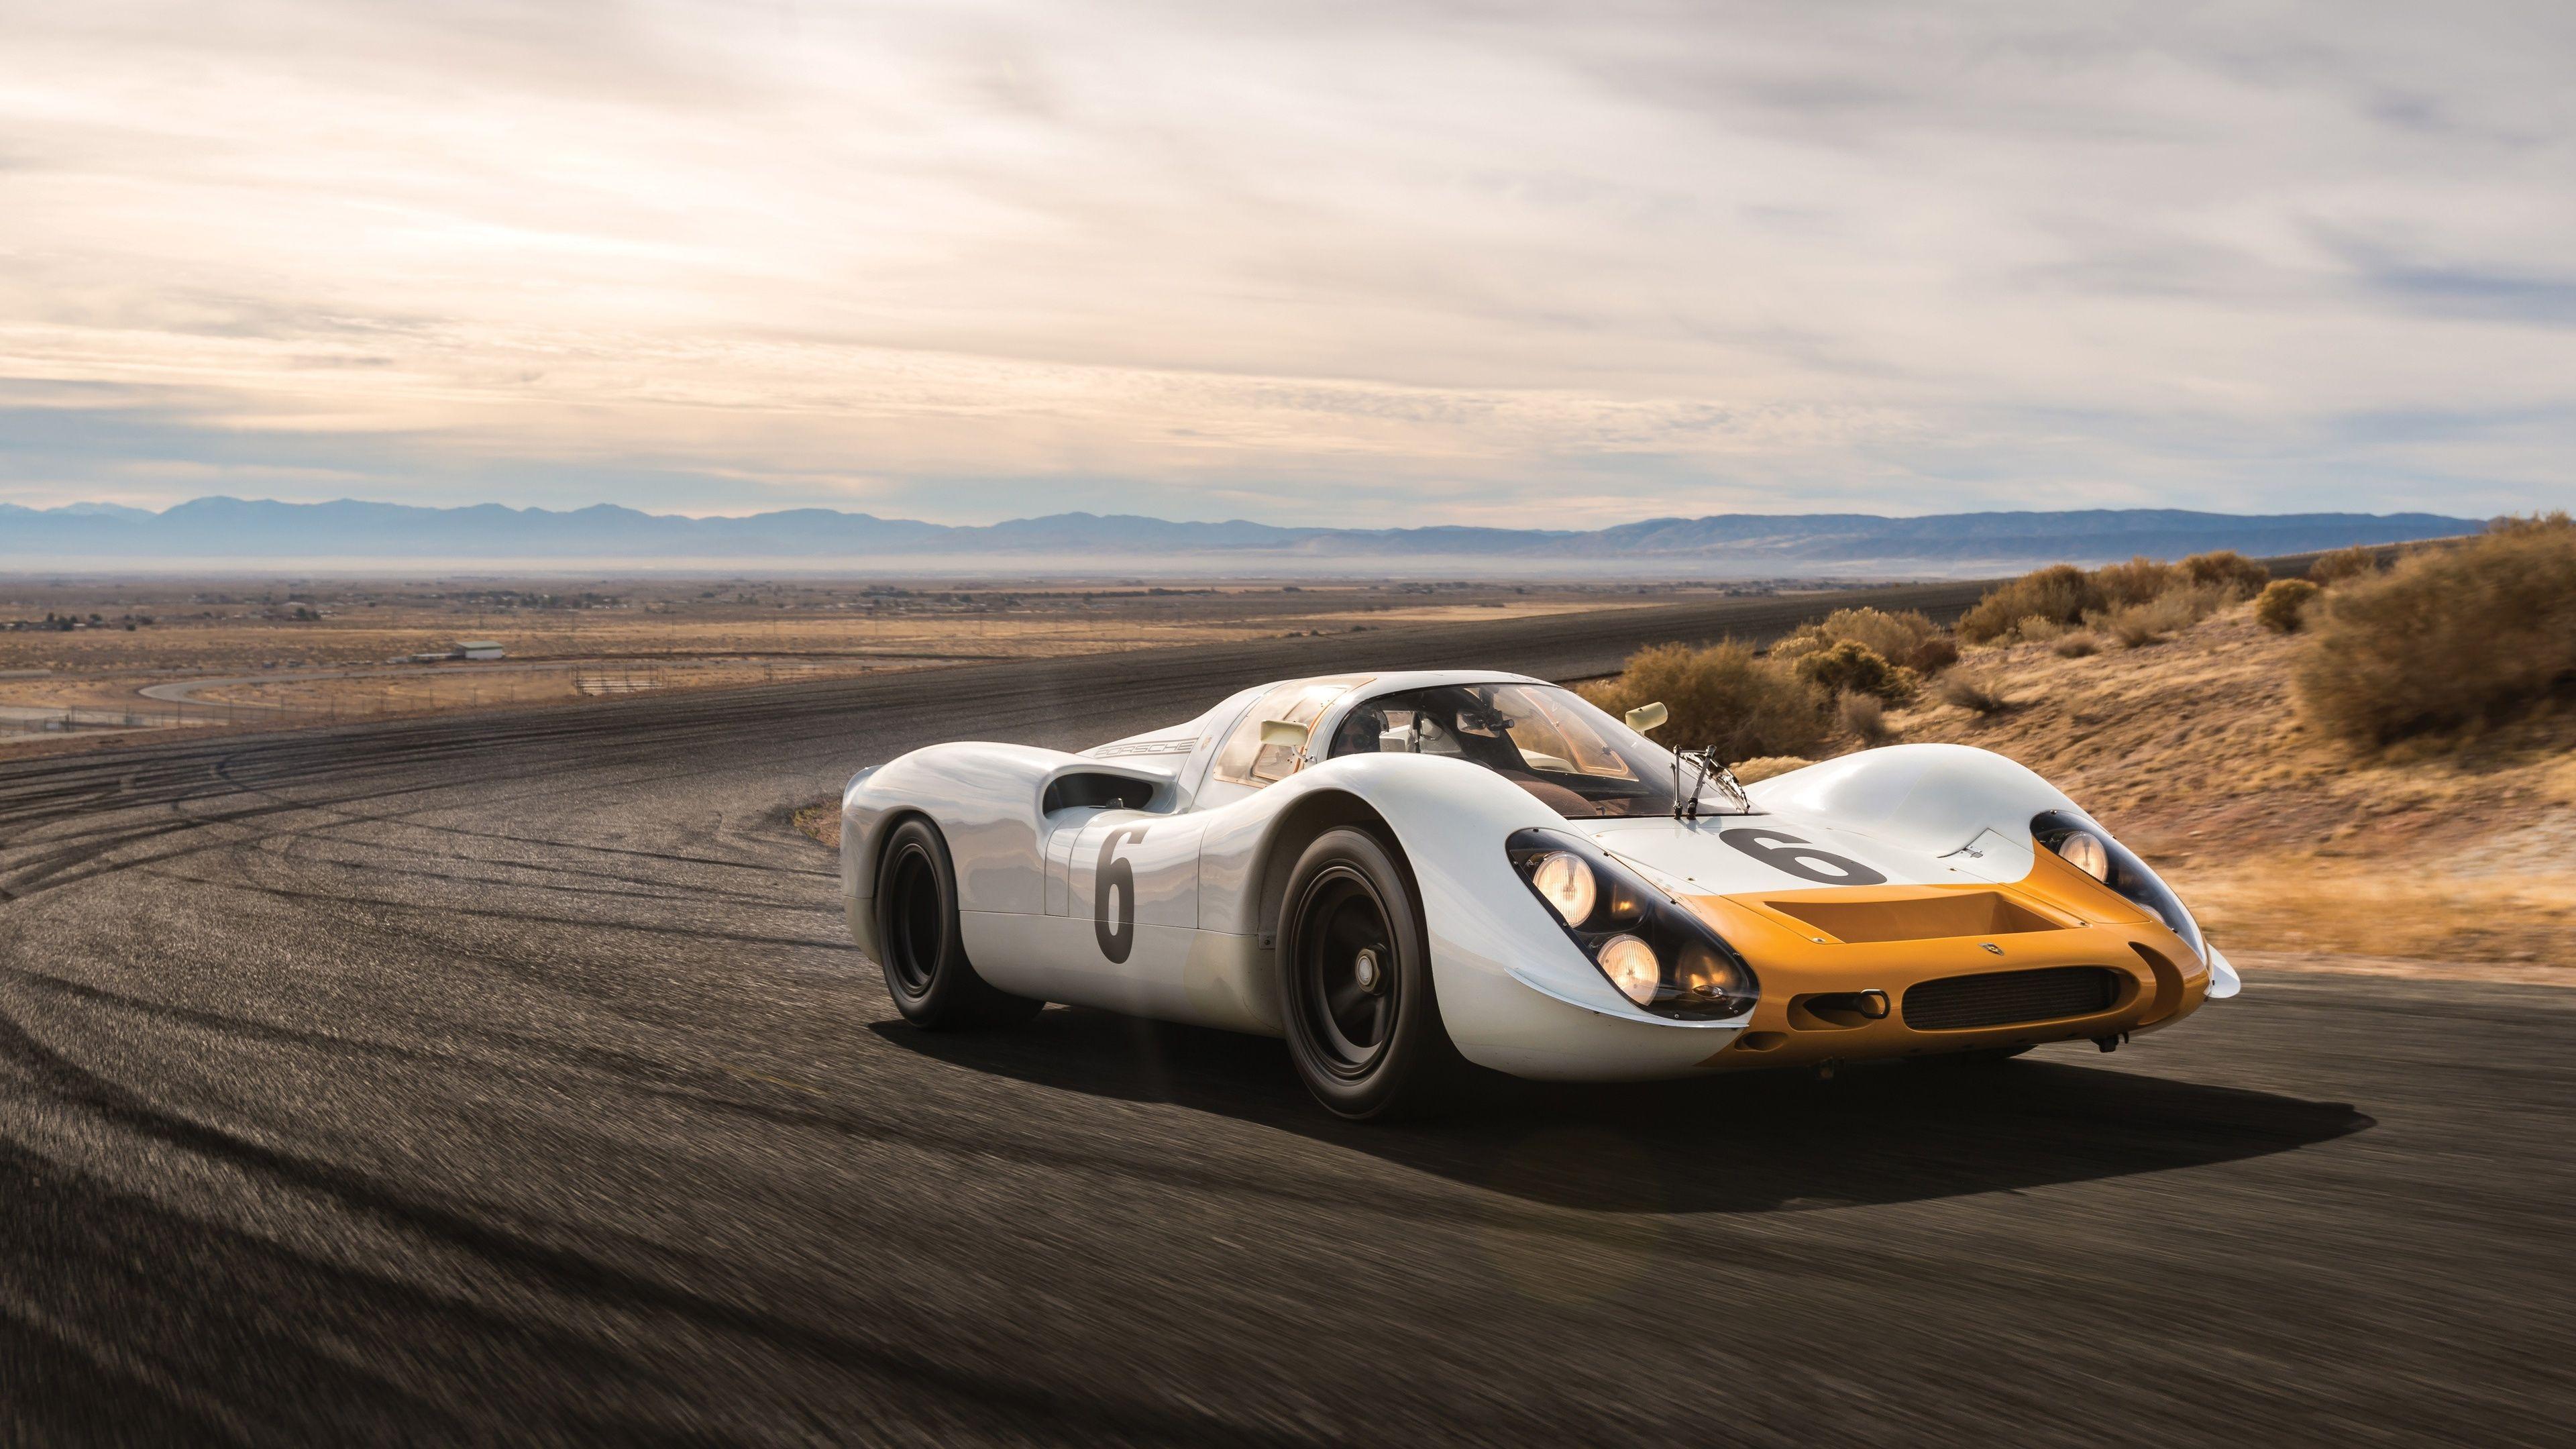 Wallpaper 4k Porsche 908 4kwallpapers, cars wallpapers